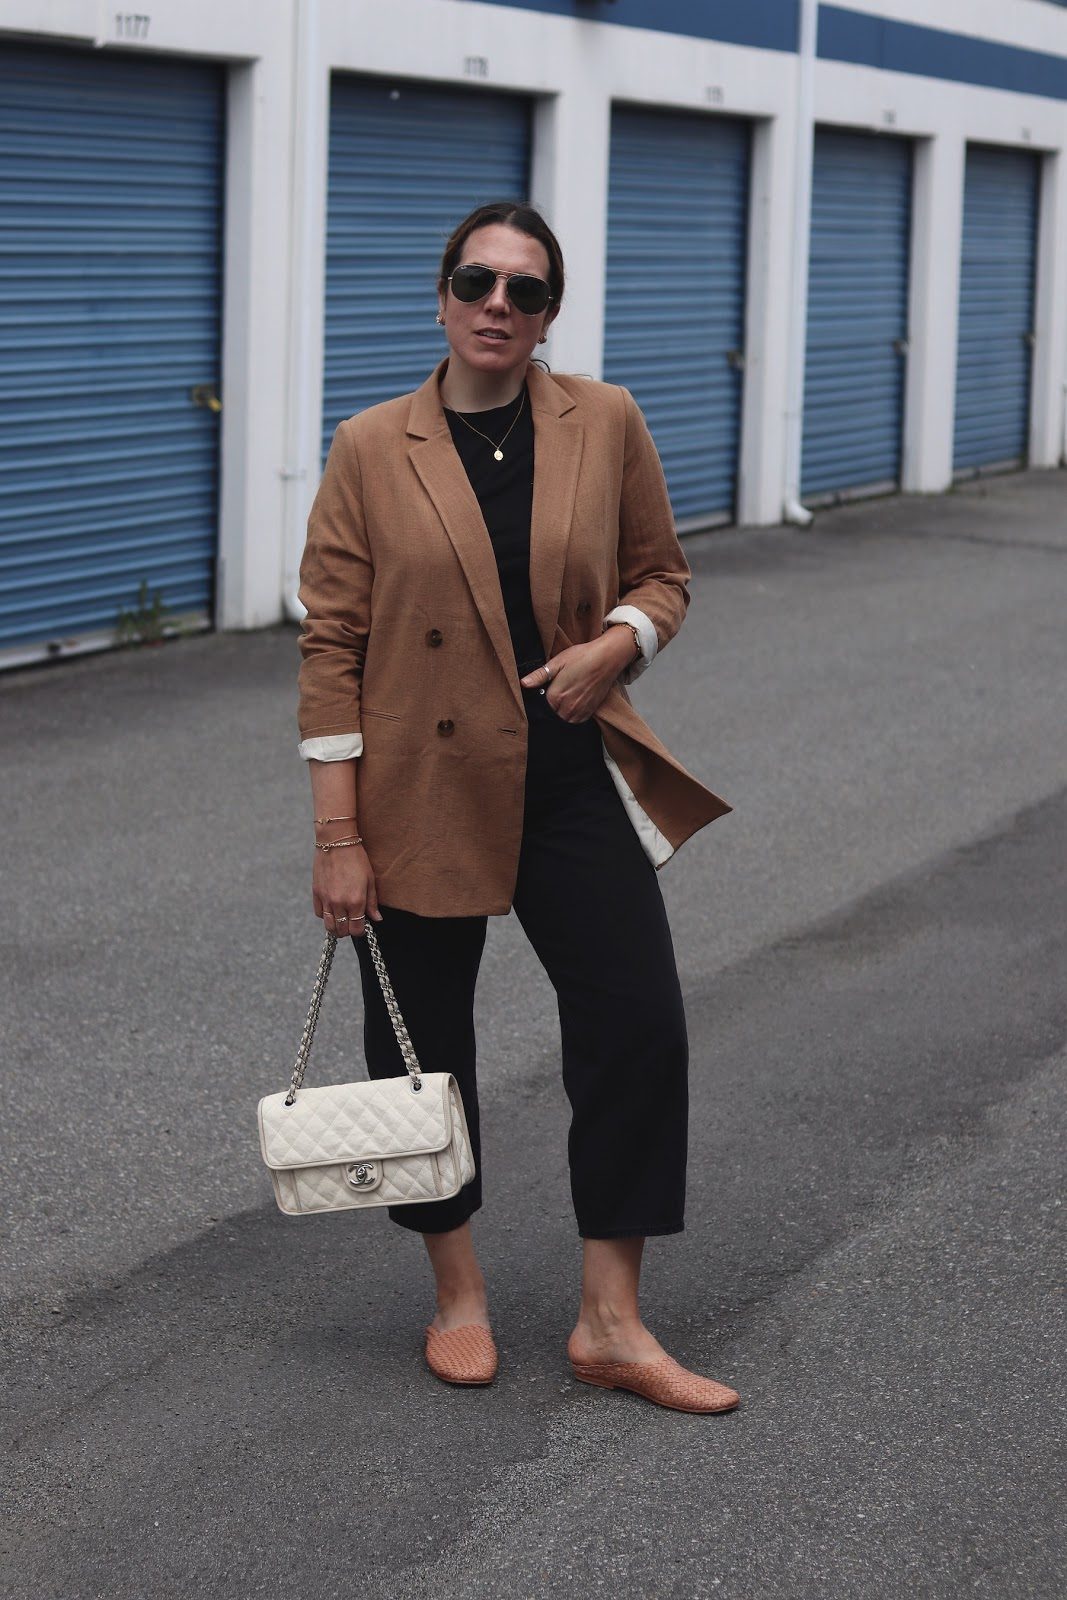 HM tan blazer levis balloon jeans outfit chanel french riviera flap st agni